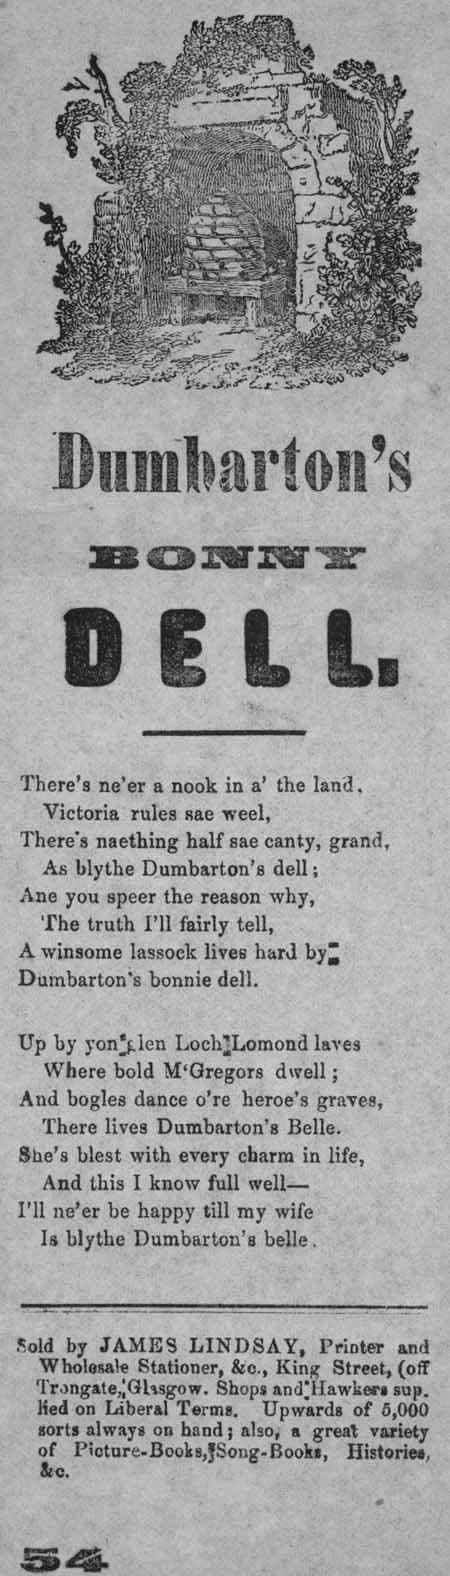 Broadside ballad entitled 'Dumbarton's Bonny Dell'